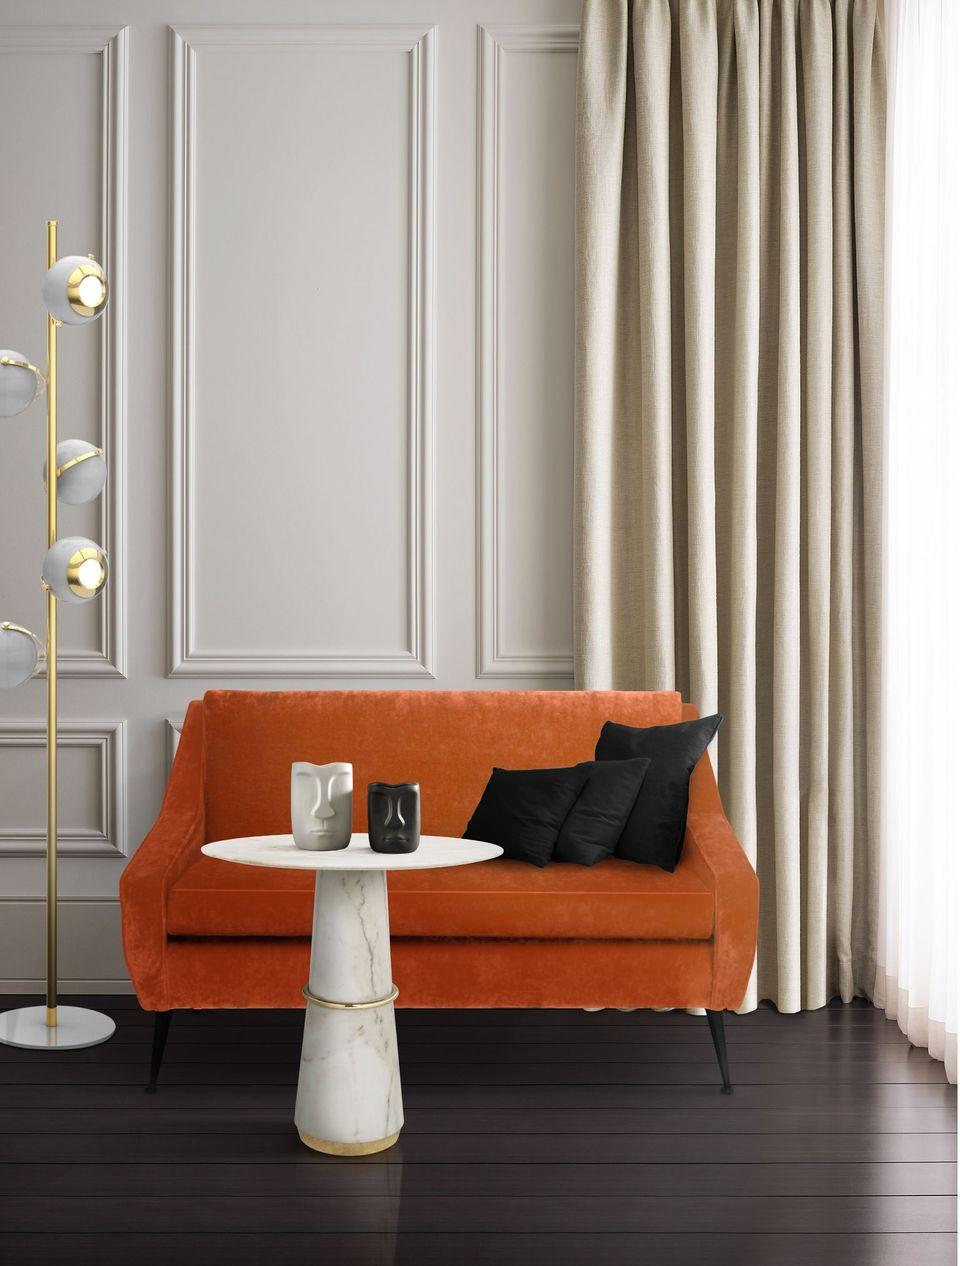 modern sofas 25 Modern Sofas To Buy Online – PART II ZBKIzHzC